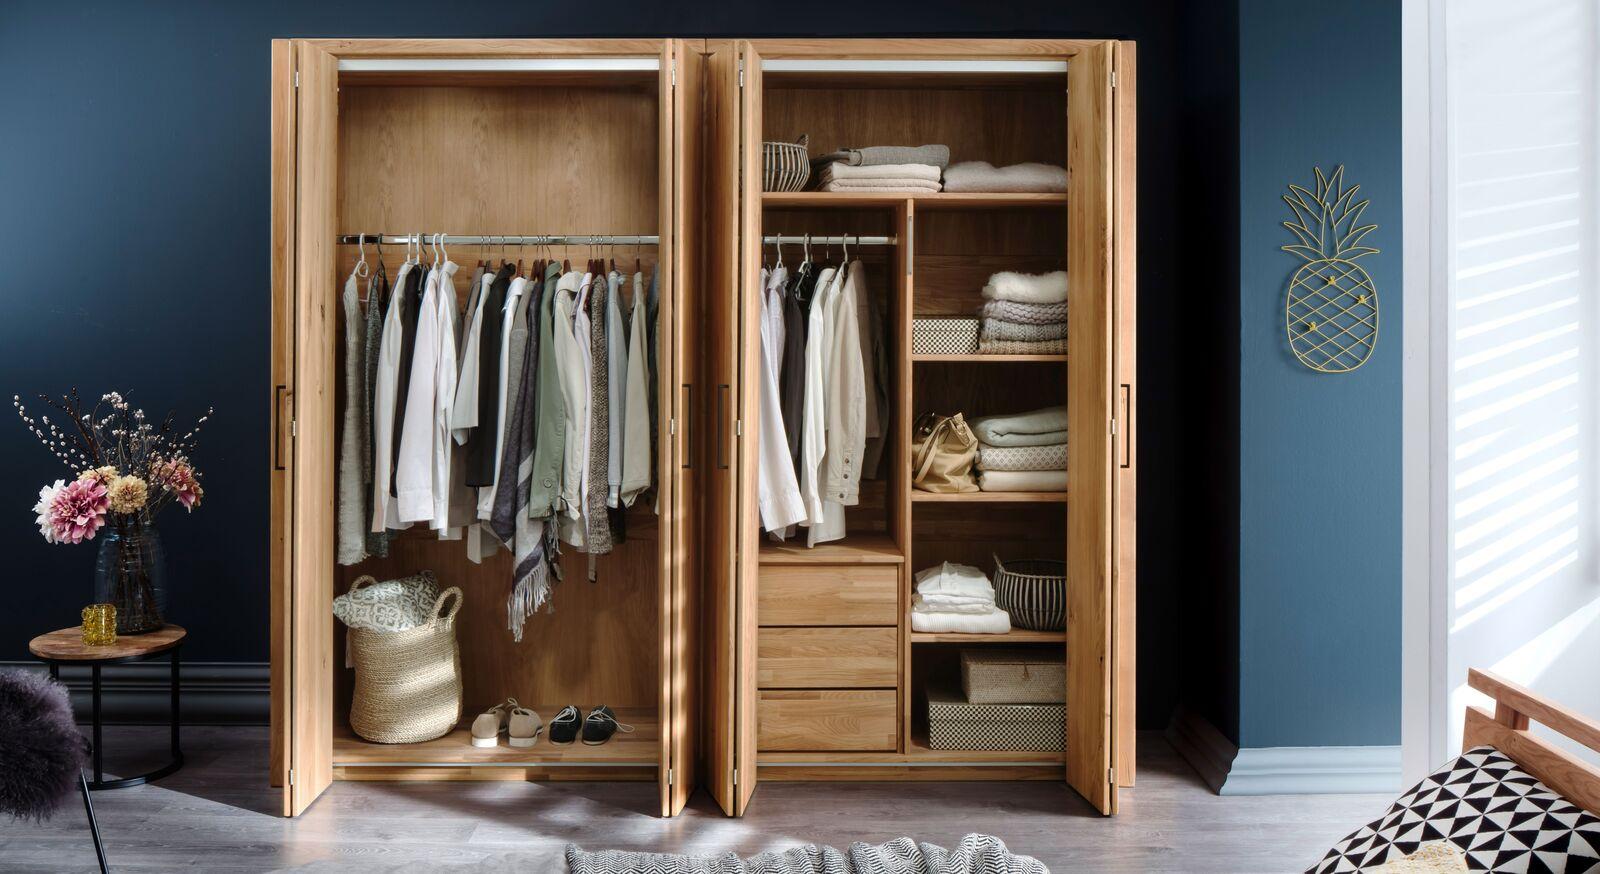 Falttüren-Kleiderschrank Lisana mit optionaler Innenausstattung